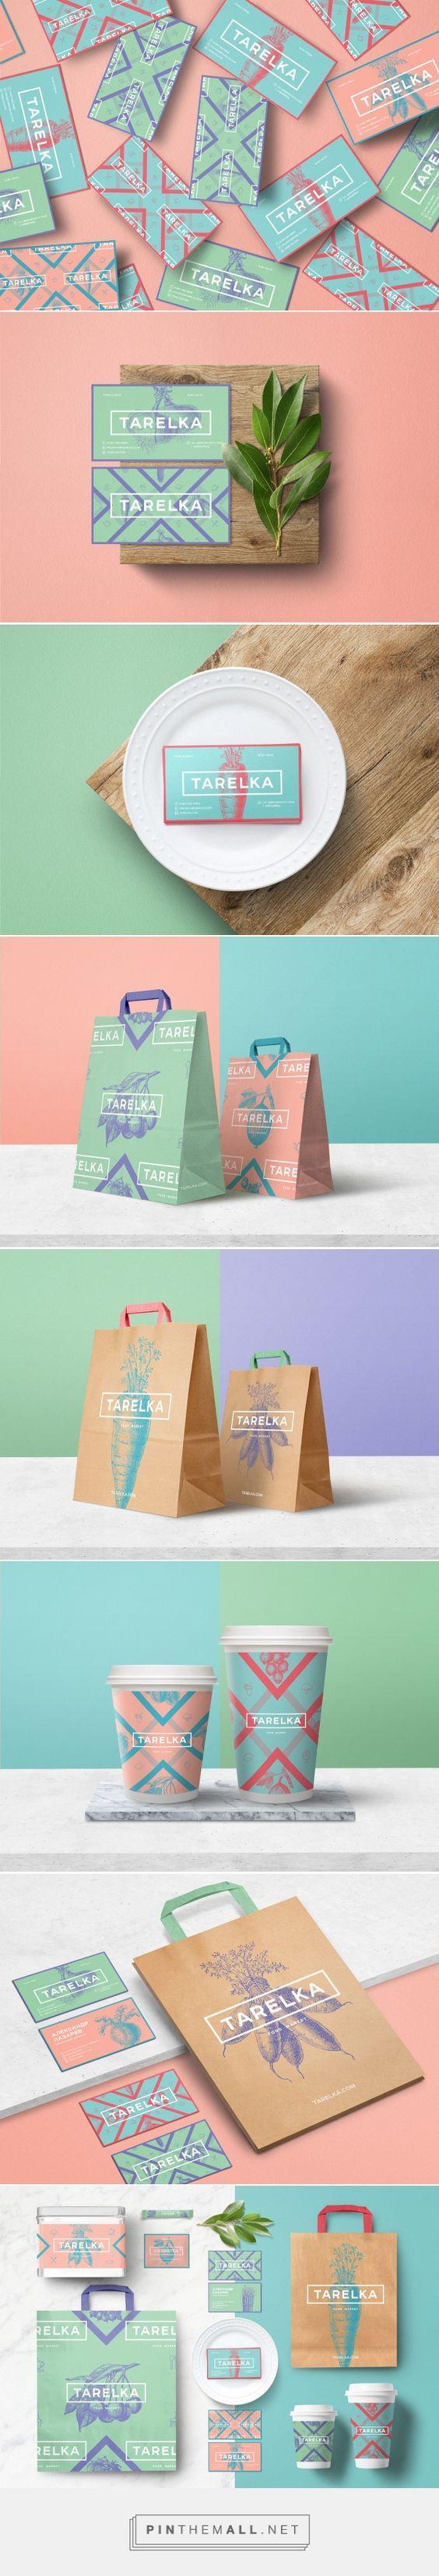 Tarelka Food Market Branding on Behance | Fivestar Branding – Design and Branding Agency & Inspiration Gallery | Professional Logo and Website Design